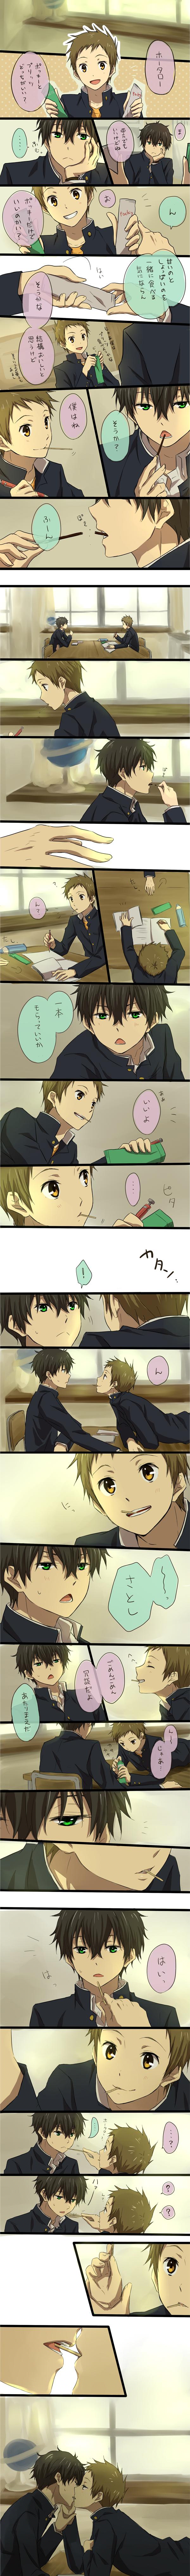 Tags: Anime, Rito, Hyouka, Oreki Houtarou, Fukube Satoshi, Holding Wrist, Eyes Half Closed, Writing